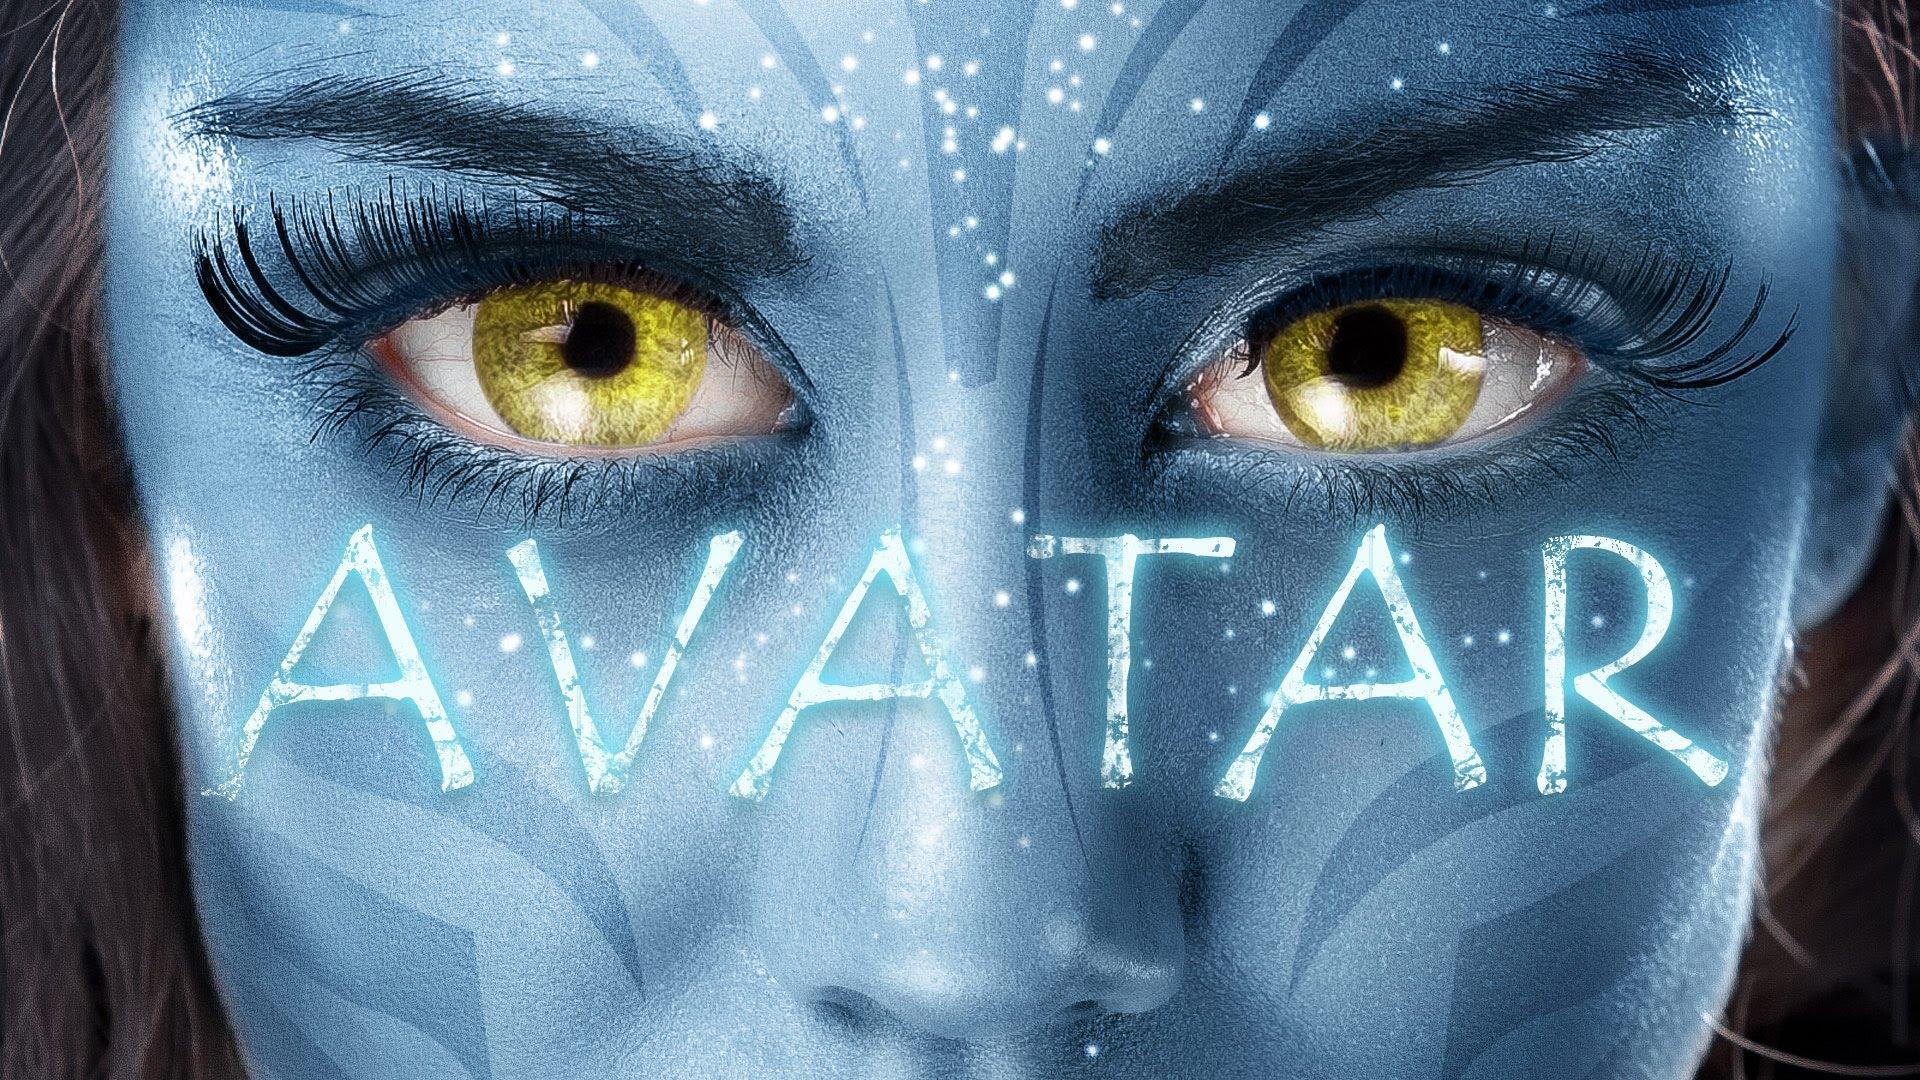 Avatar Navi Effect - Photoshop tutorial